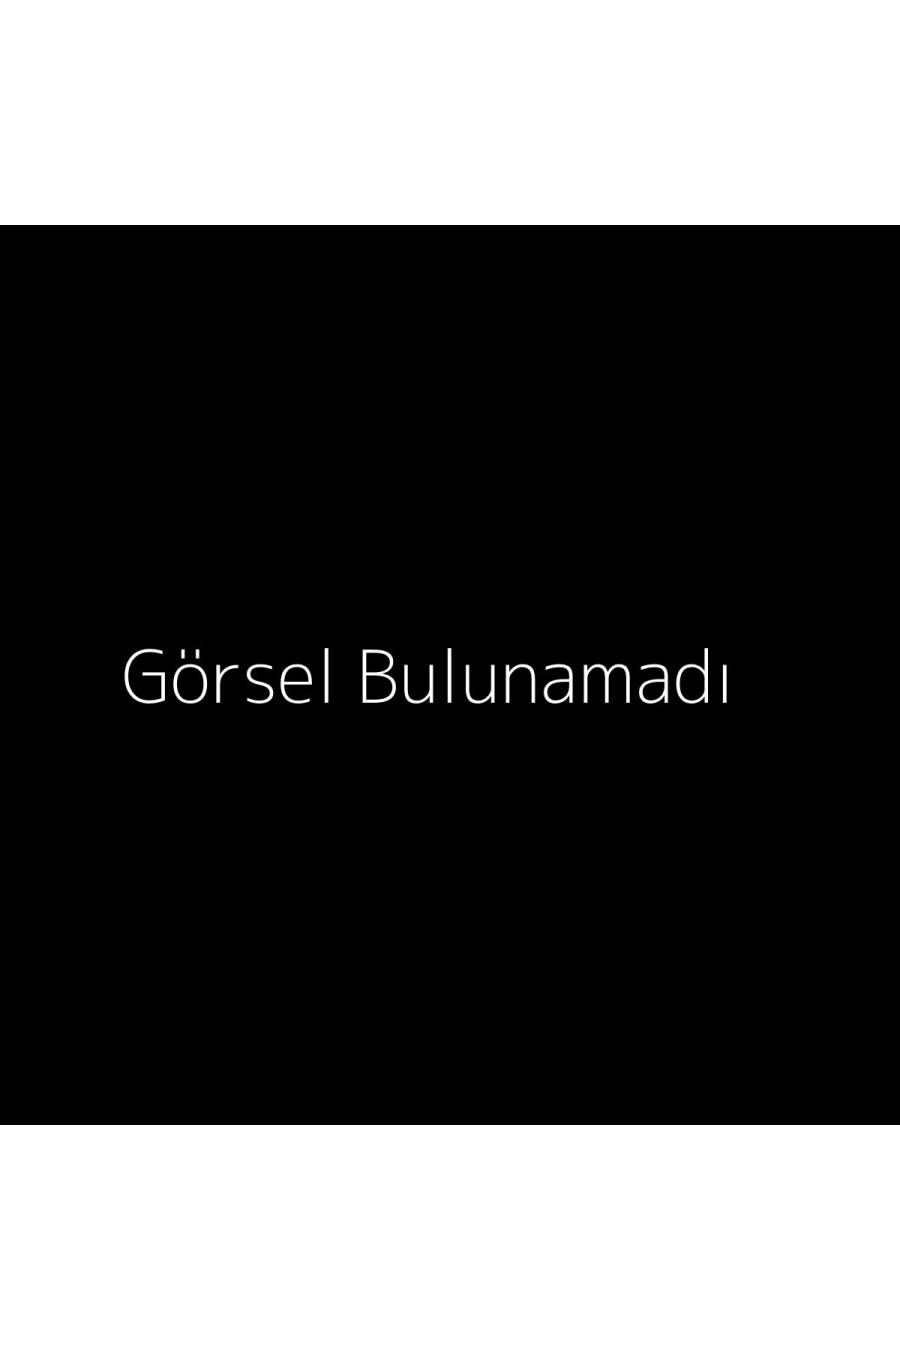 FW17008 pants